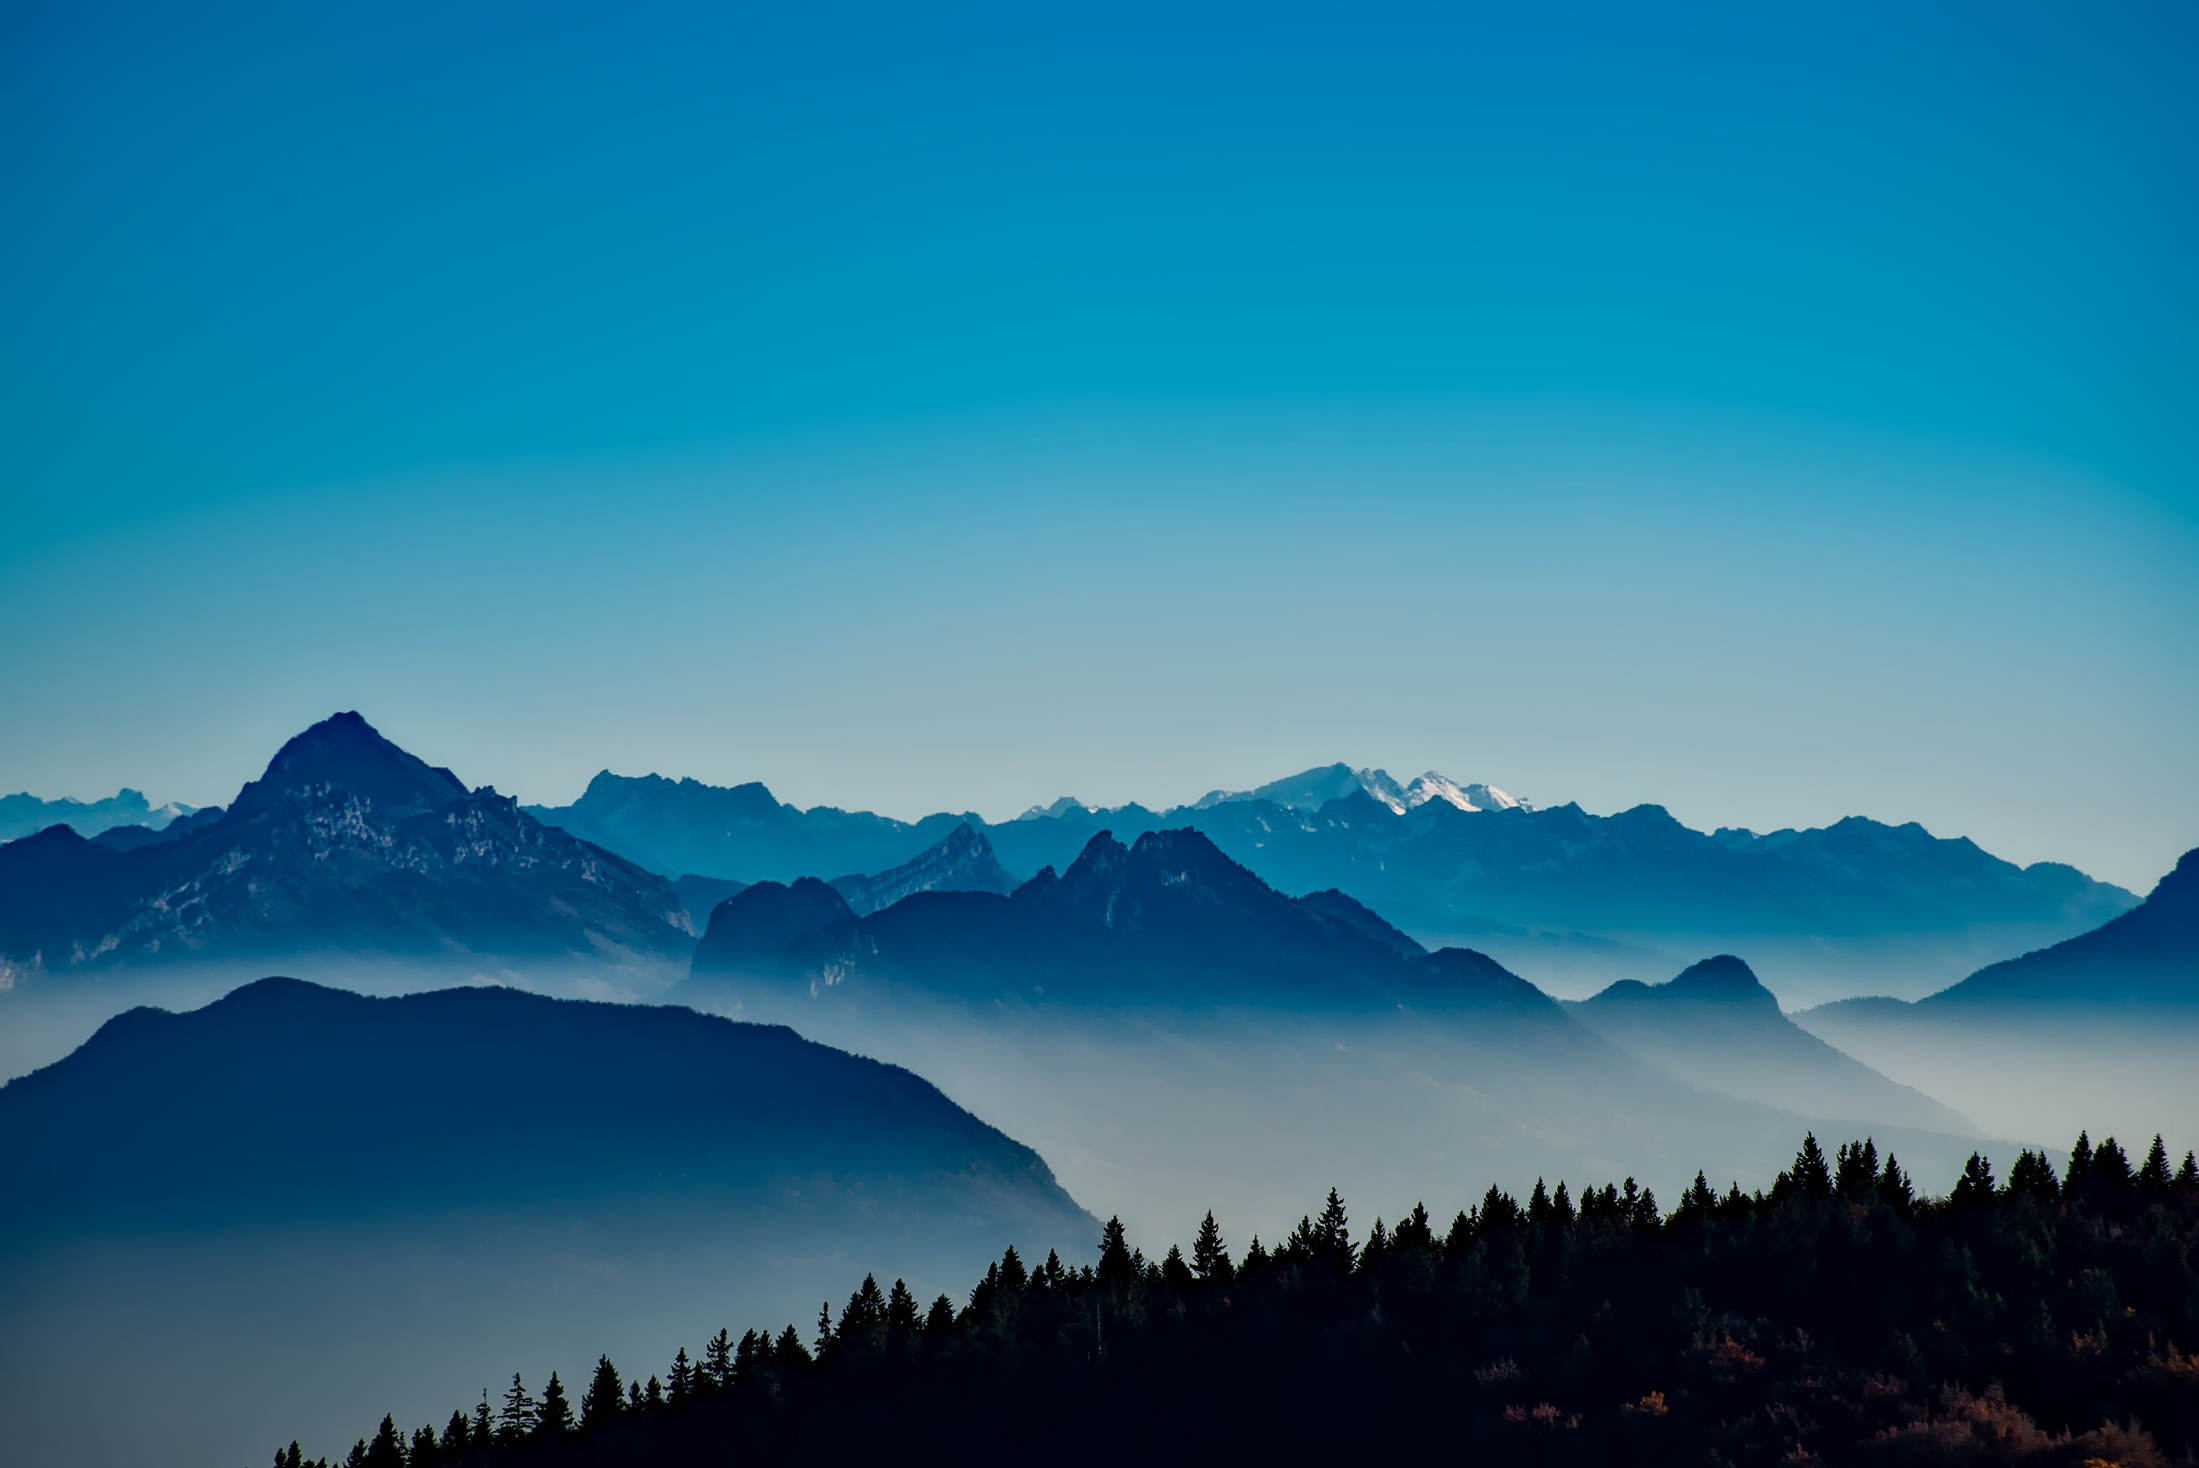 800x1280 Mountains Mist Trees Nexus 7 Samsung Galaxy Tab 10